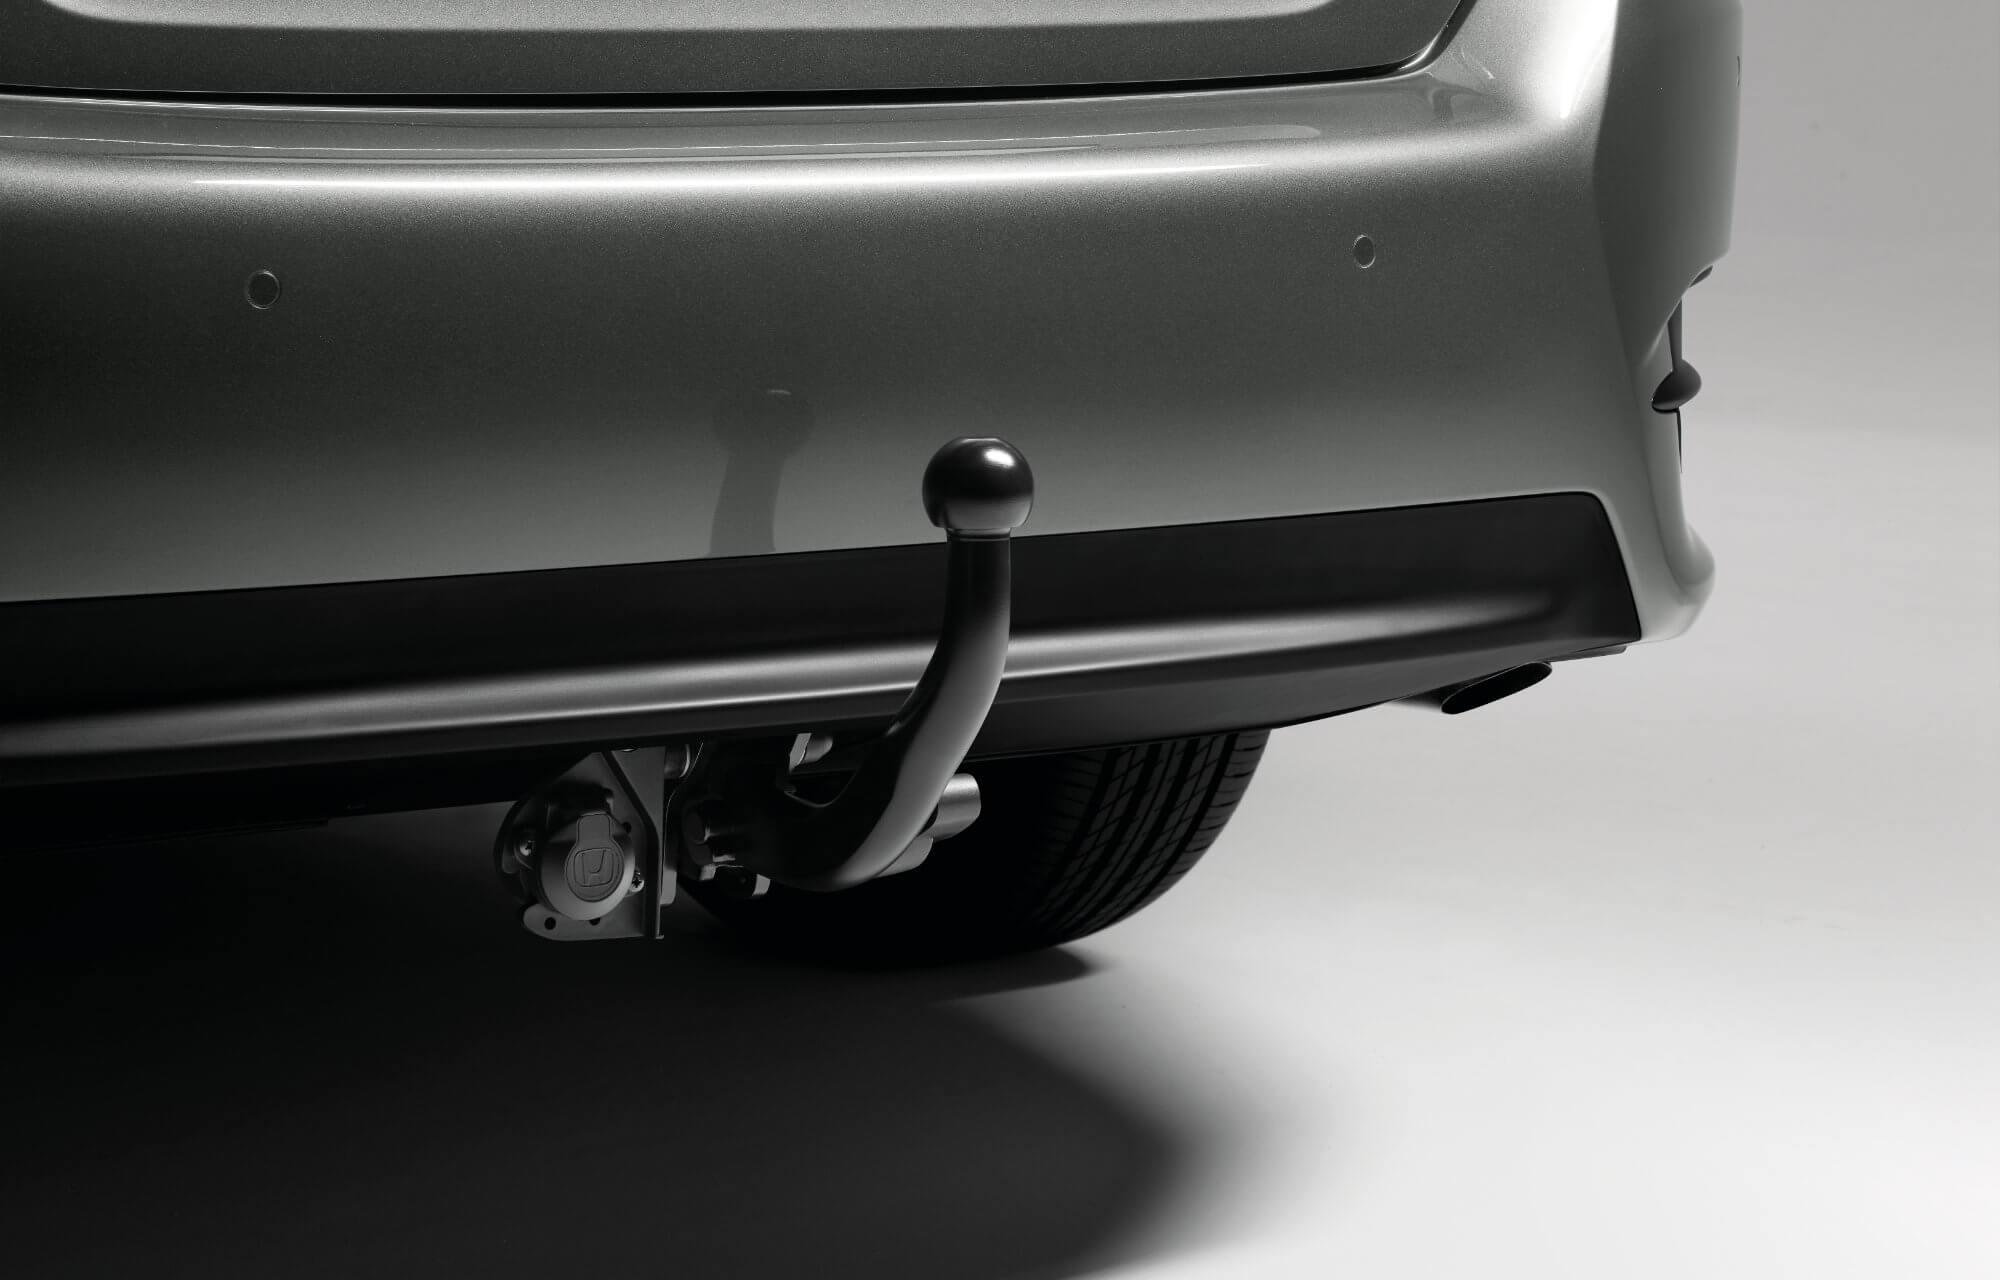 Tow Bar - Detachable/Fixed